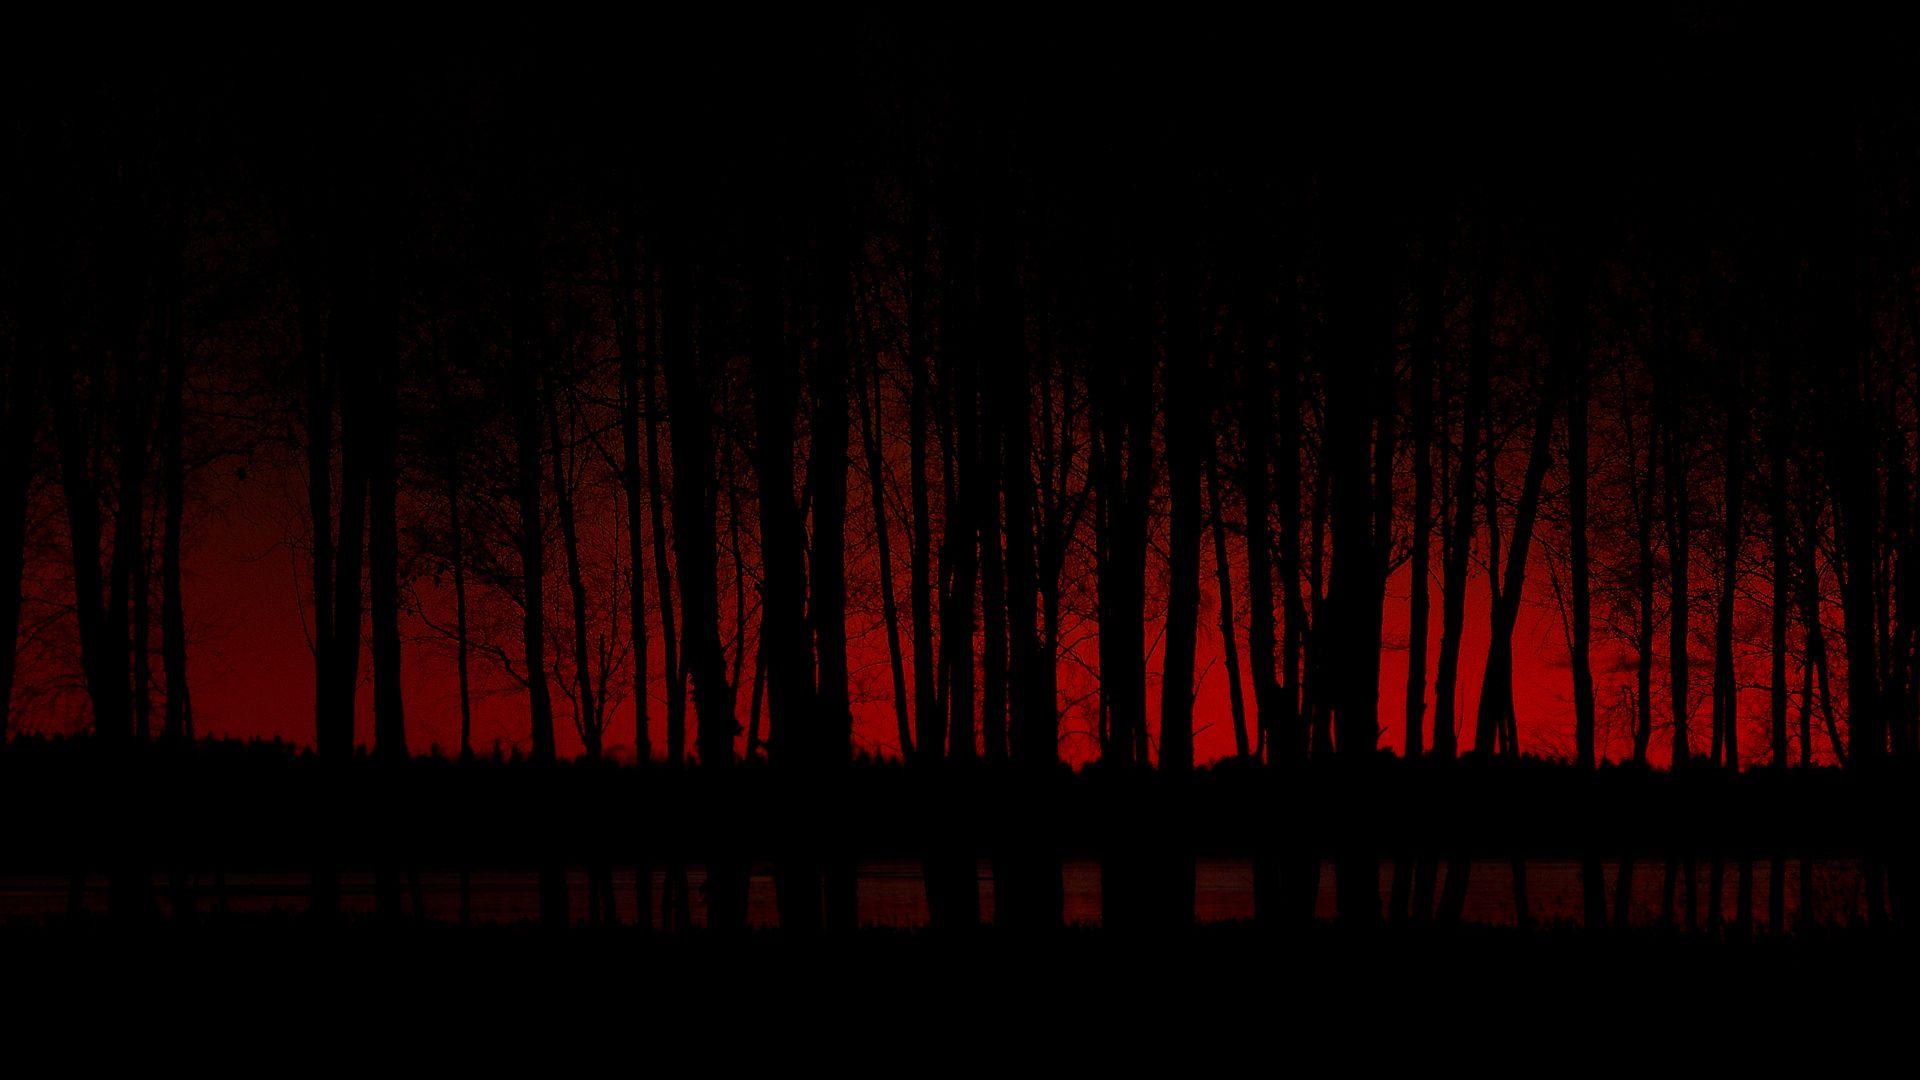 Red Sky Forest Dark Wallpaper Forest Wallpaper Dark Black Wallpaper